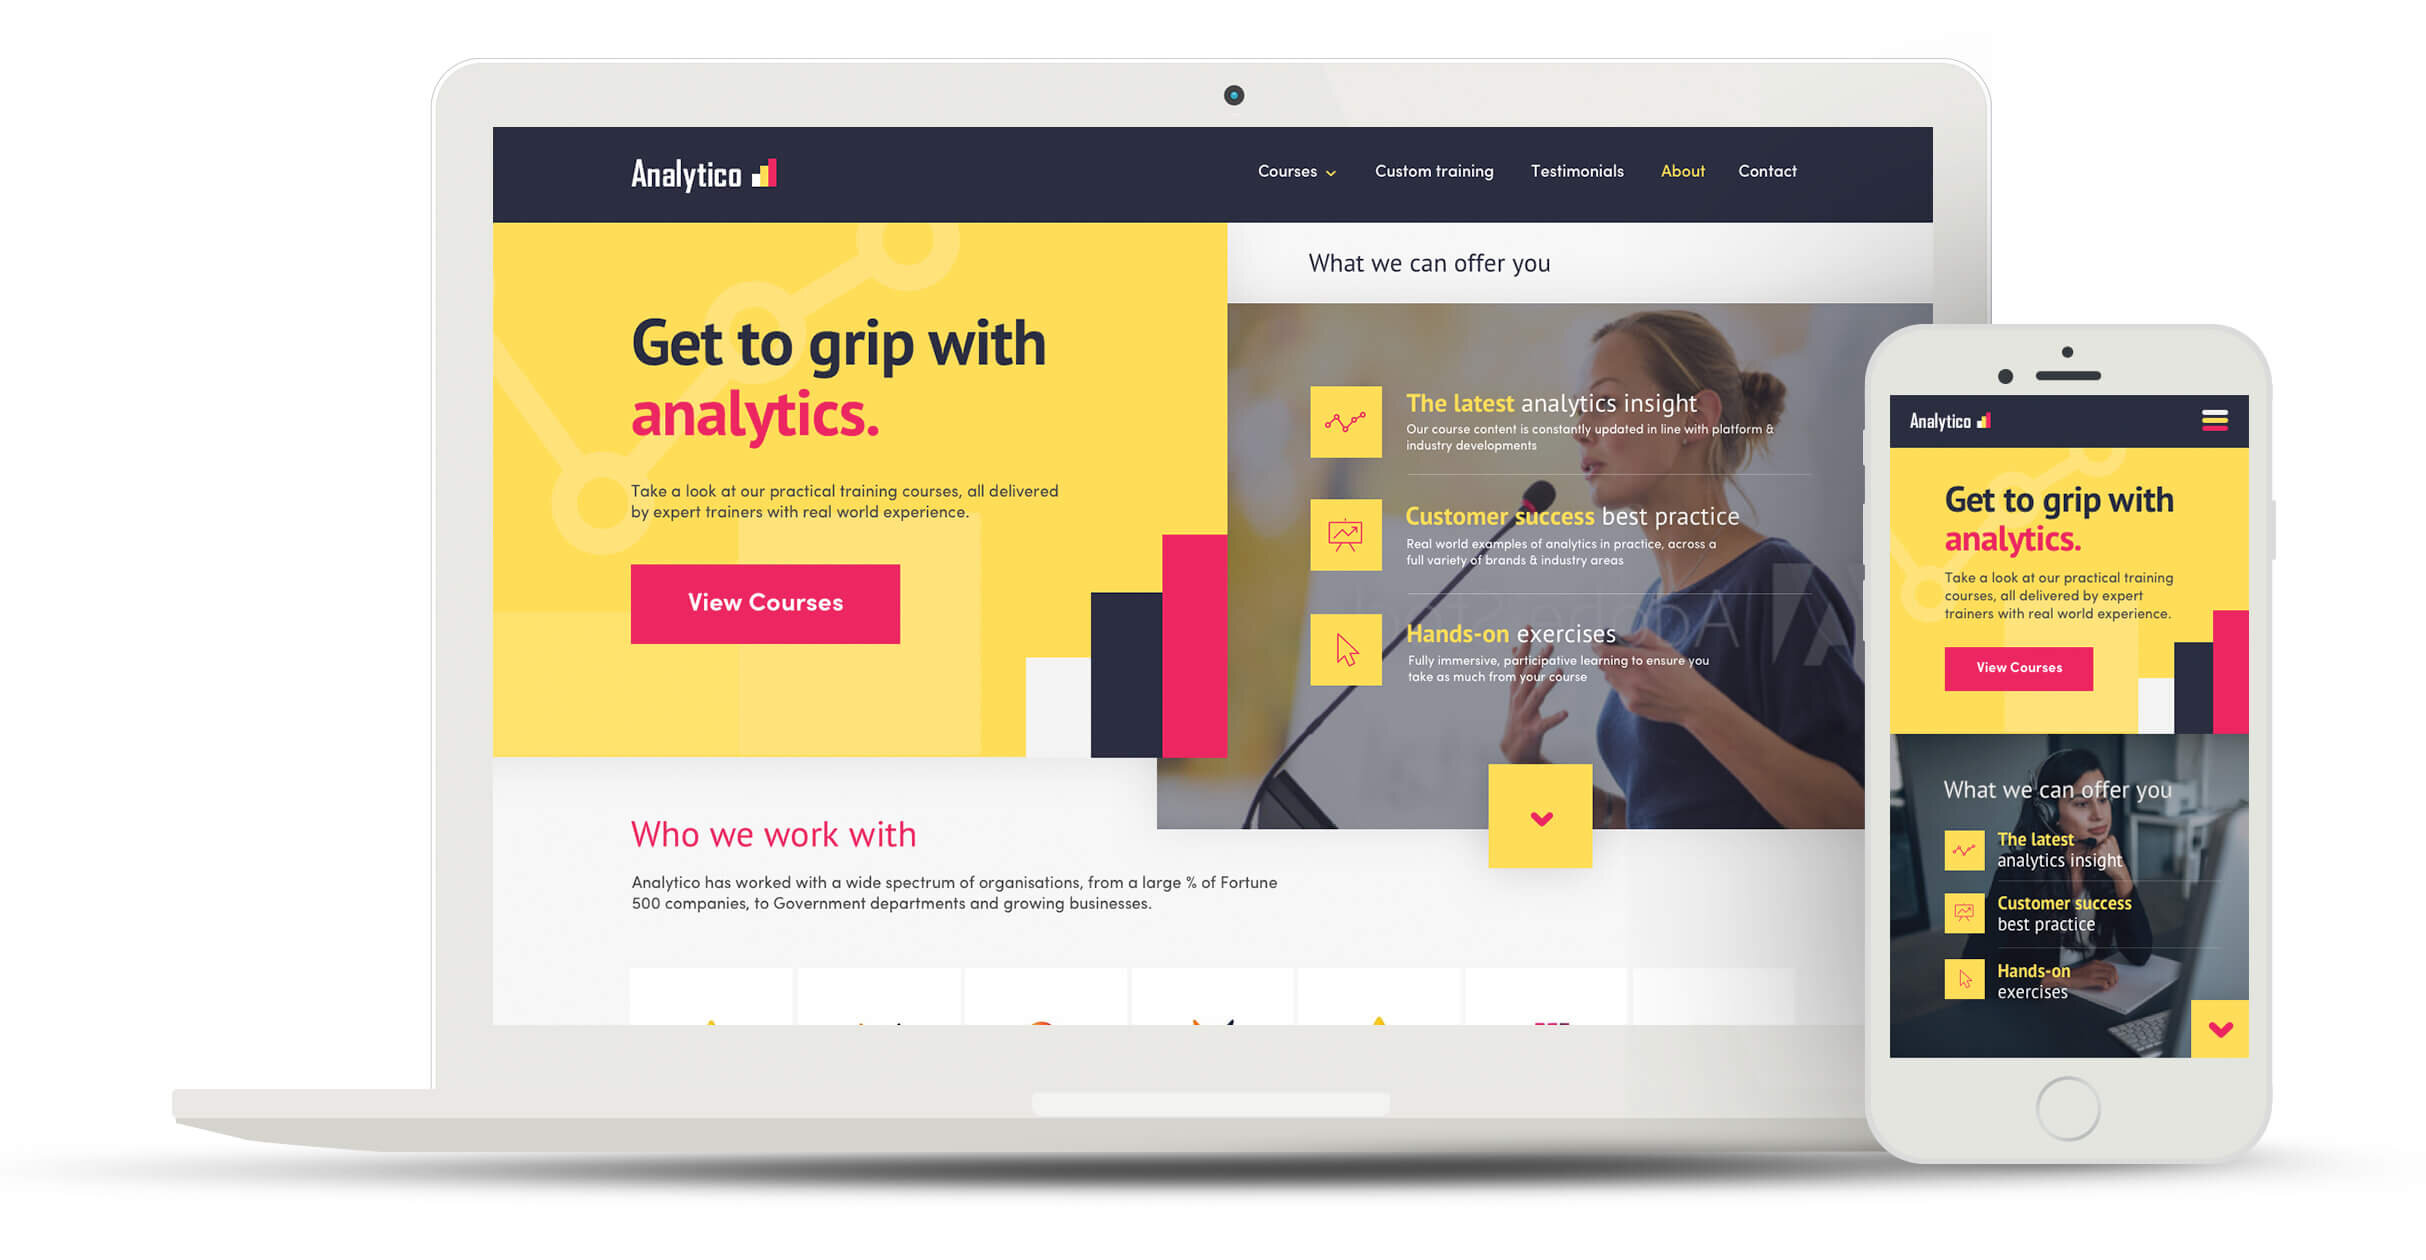 Analytico-site-1.jpg